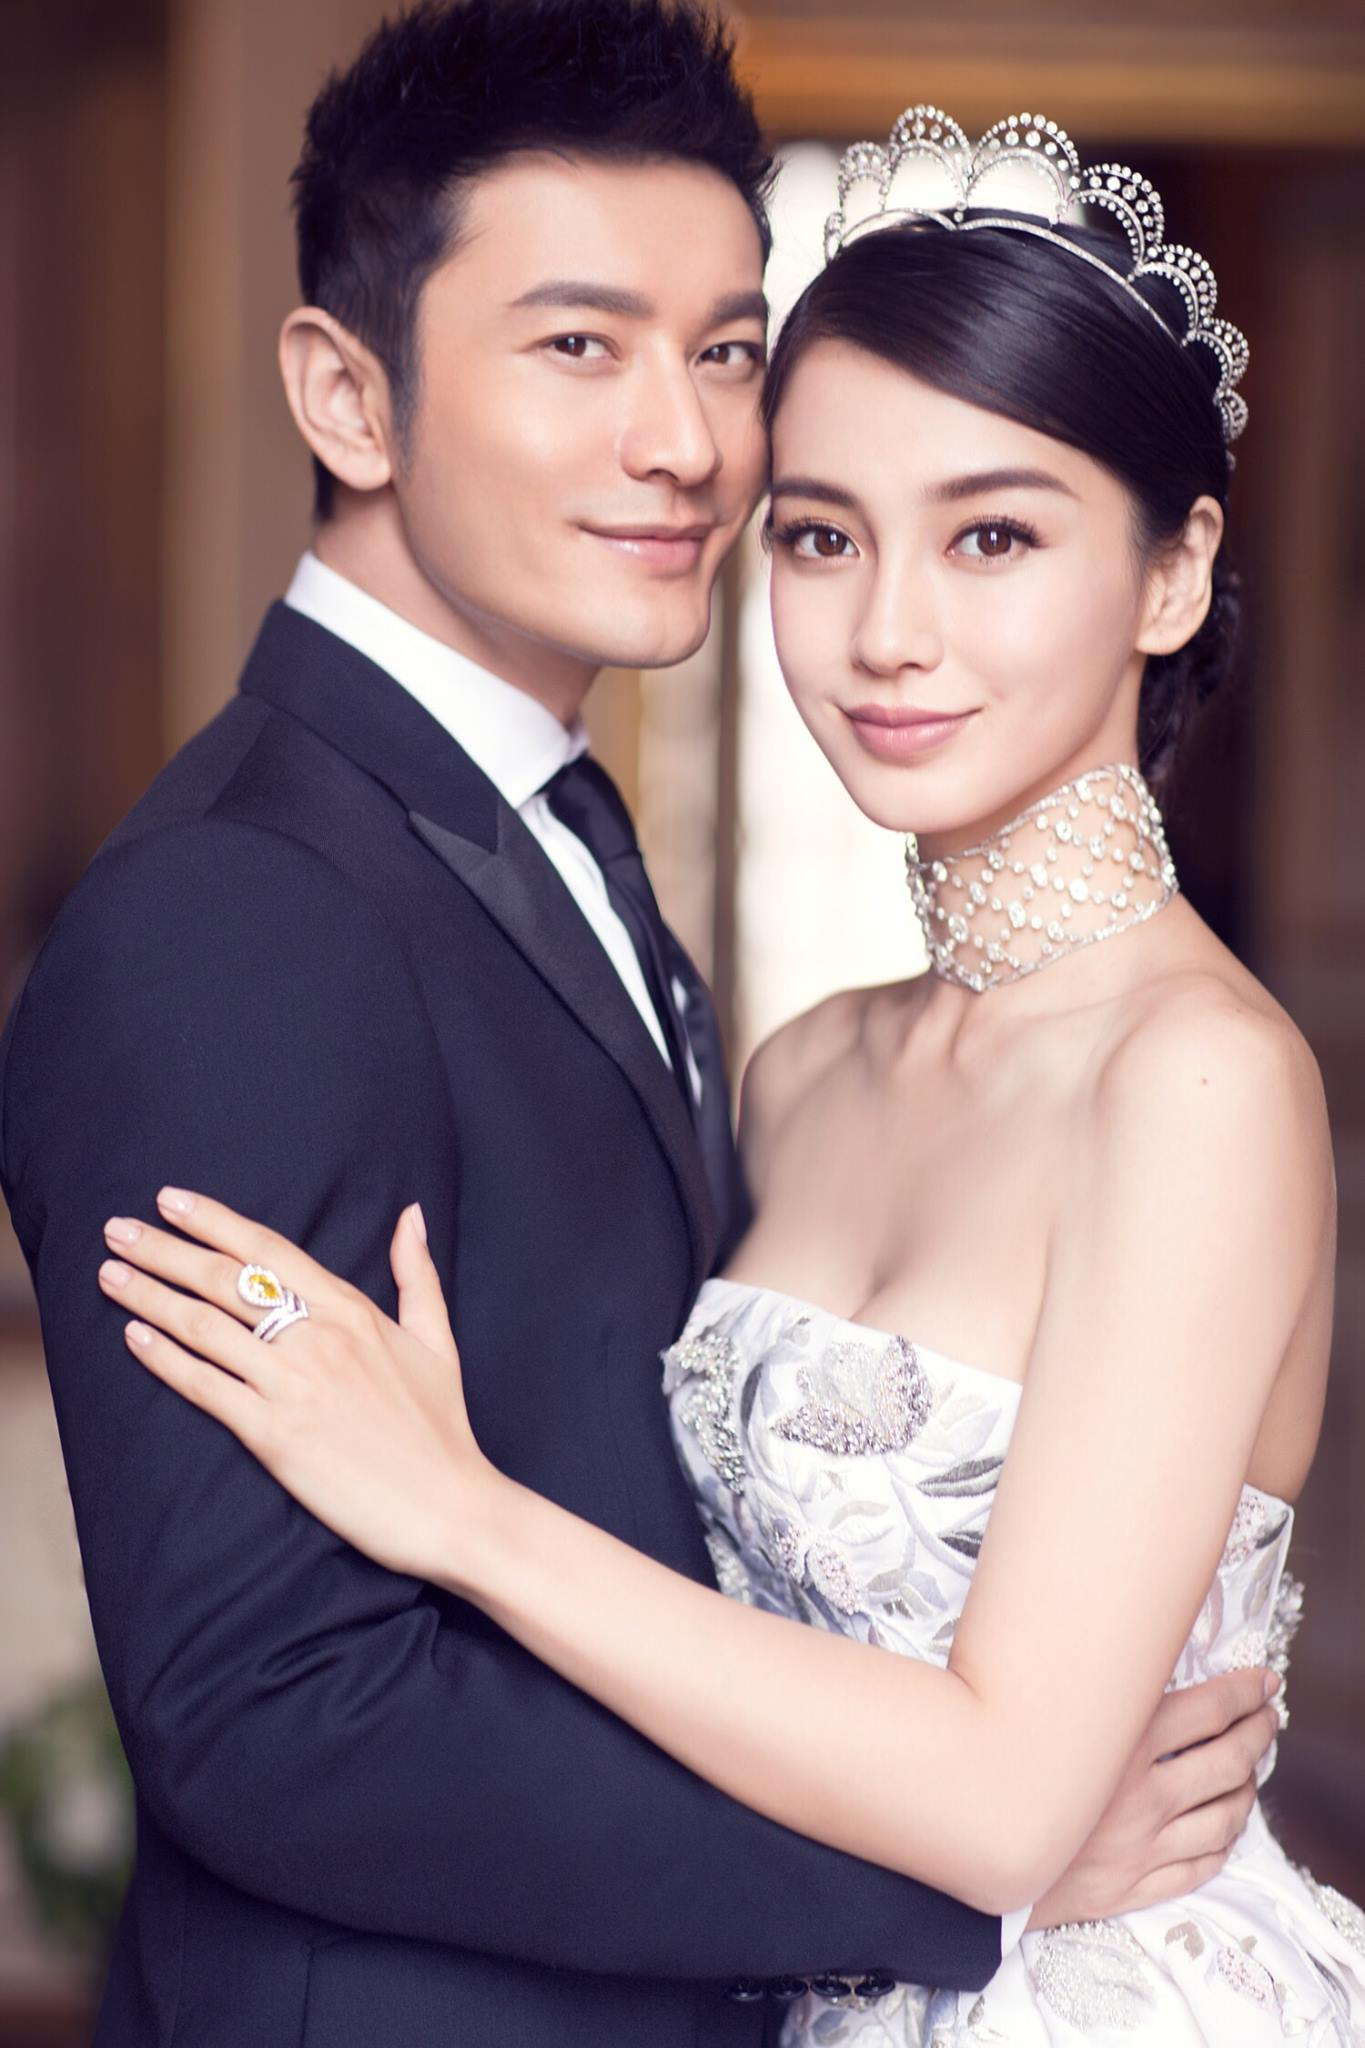 Megabucks 'fairy tale' wedding of actor Huang Xiaoming and ... | 1365 x 2048 jpeg 184kB